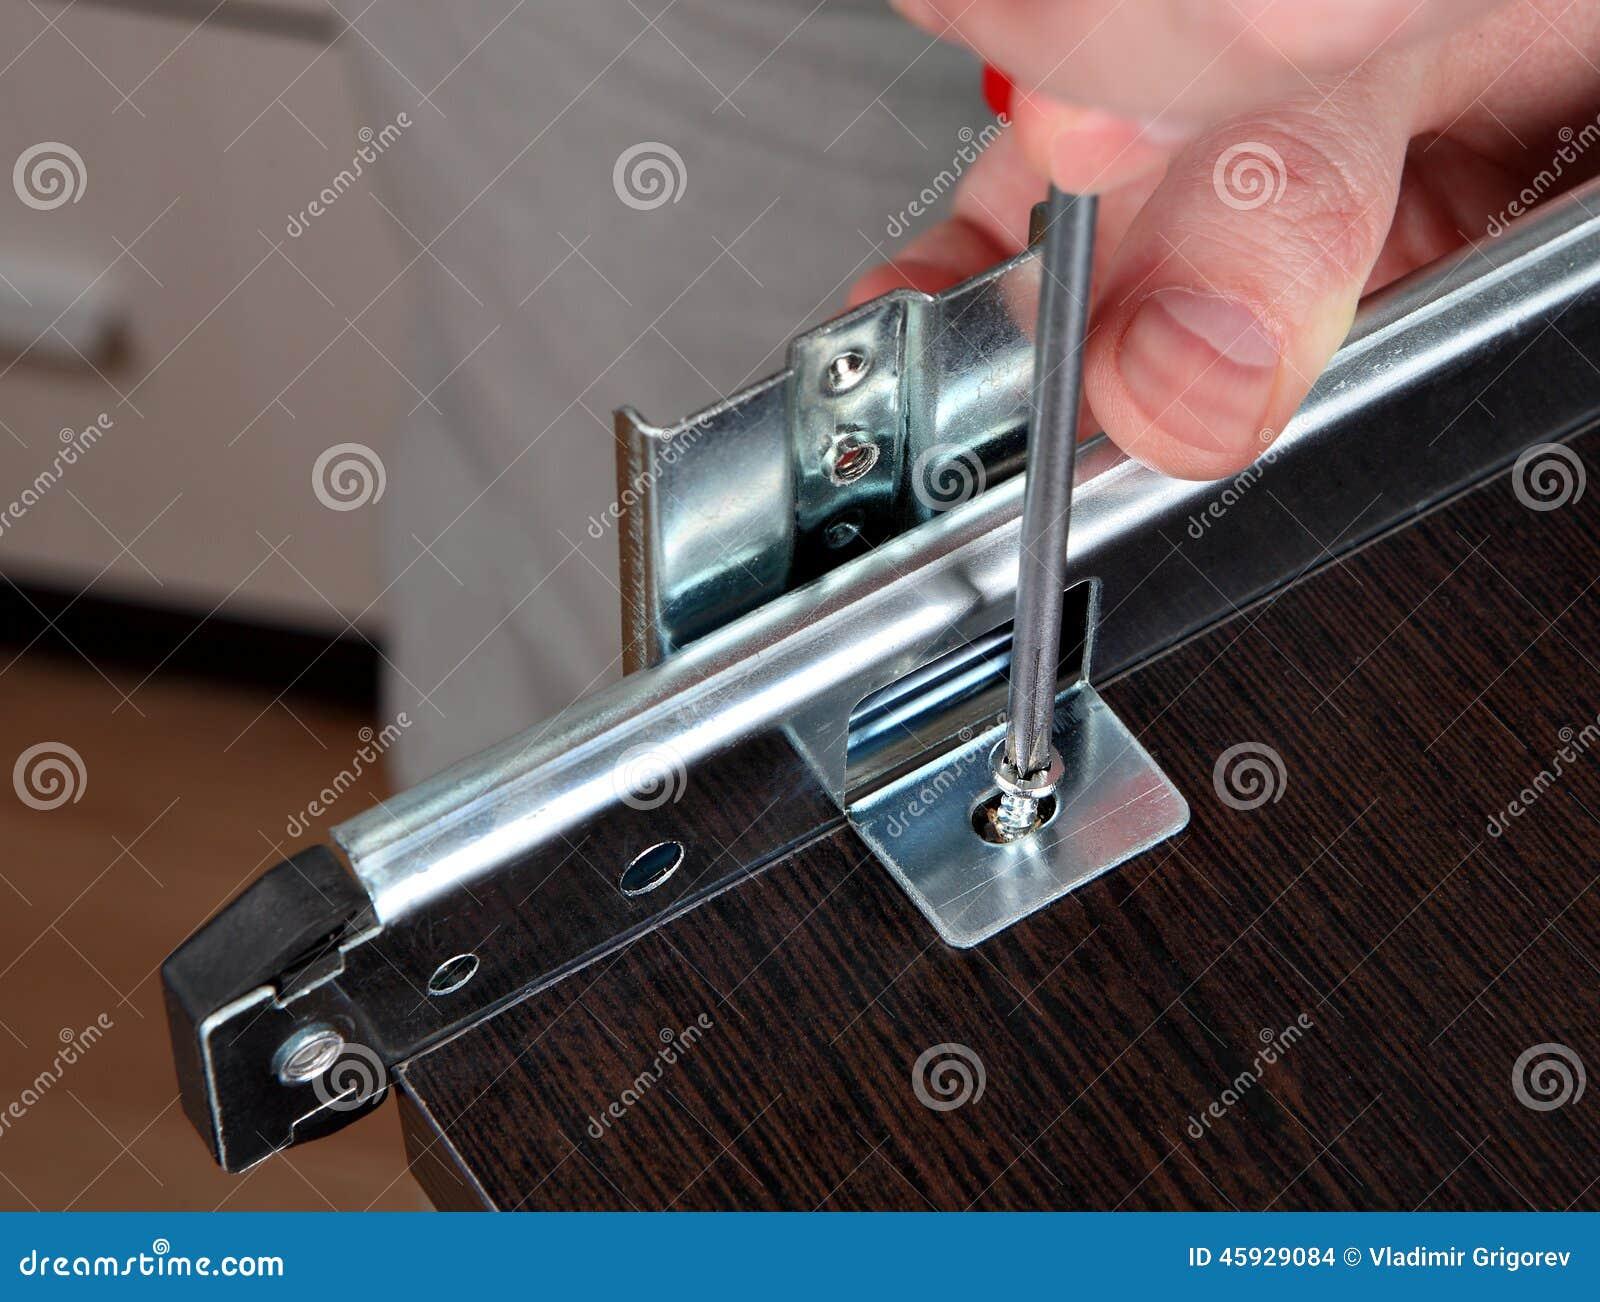 tiroirs de fixation installant le rail de glissi re de. Black Bedroom Furniture Sets. Home Design Ideas